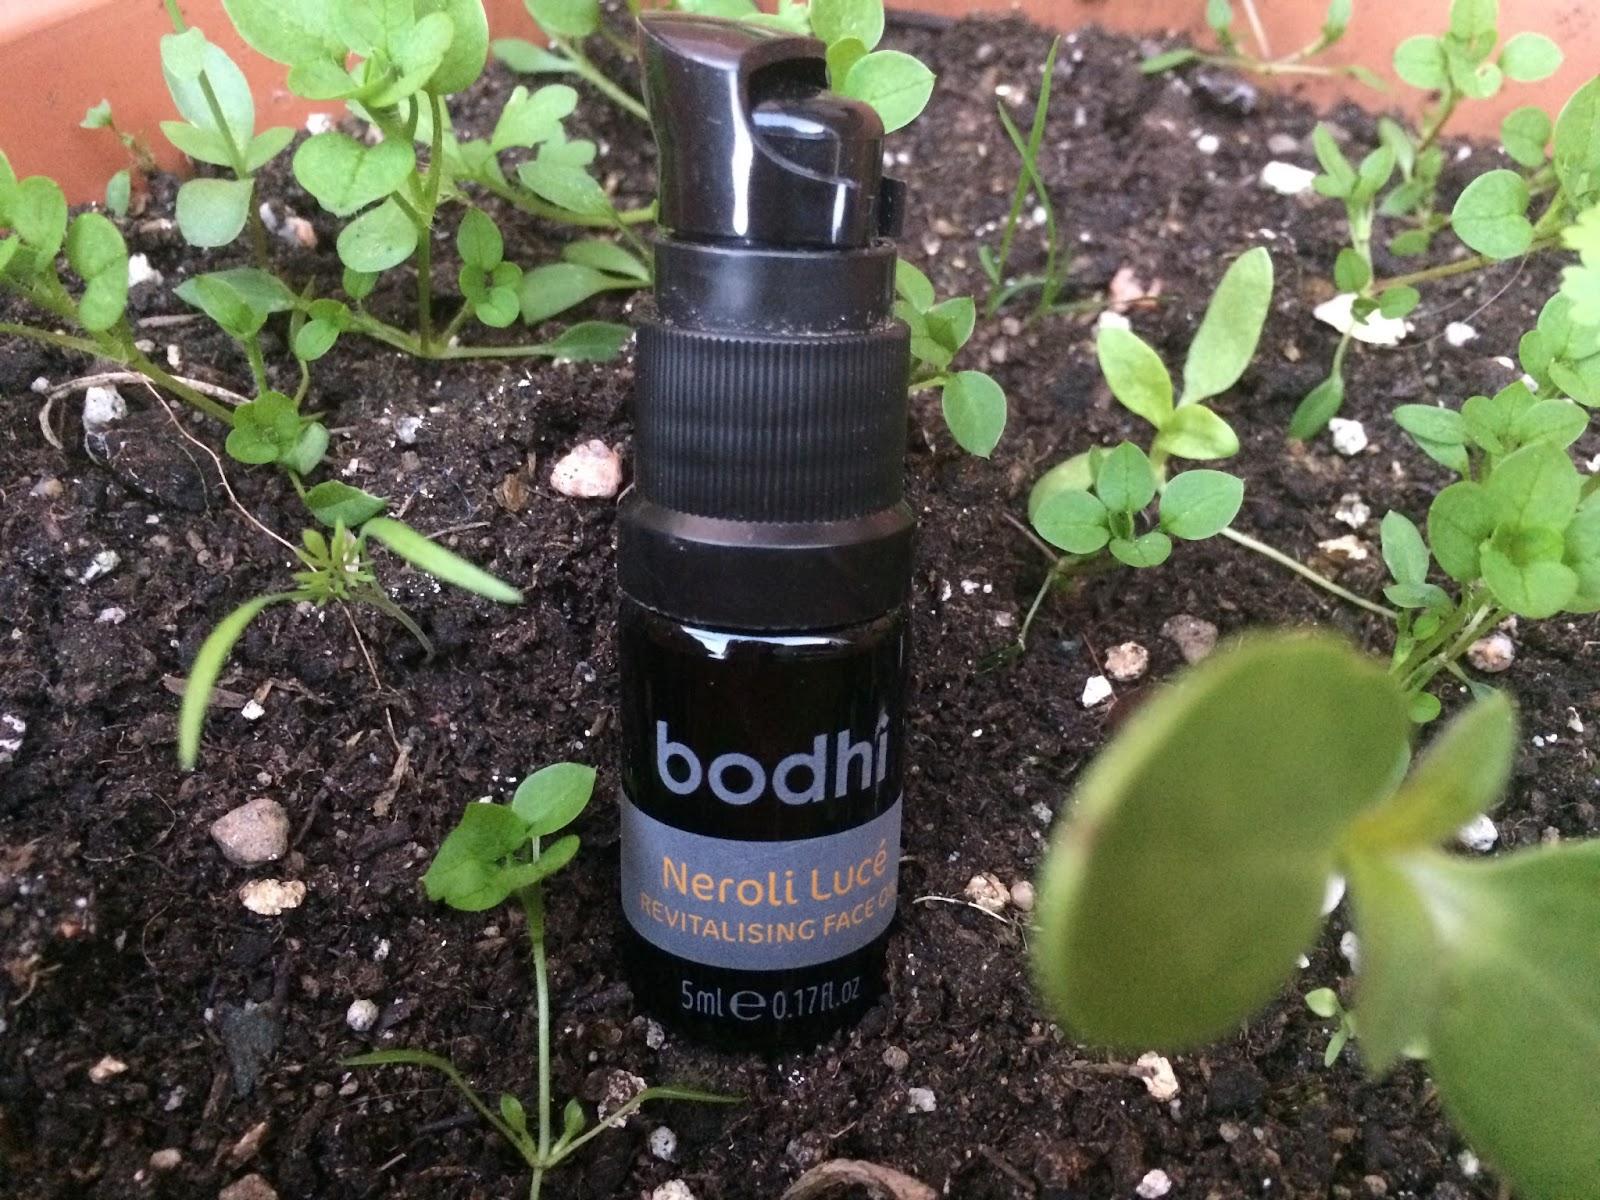 http://www.bodhi.uk.com/skincare/neroli-luce-revitalising-face-oil-detail